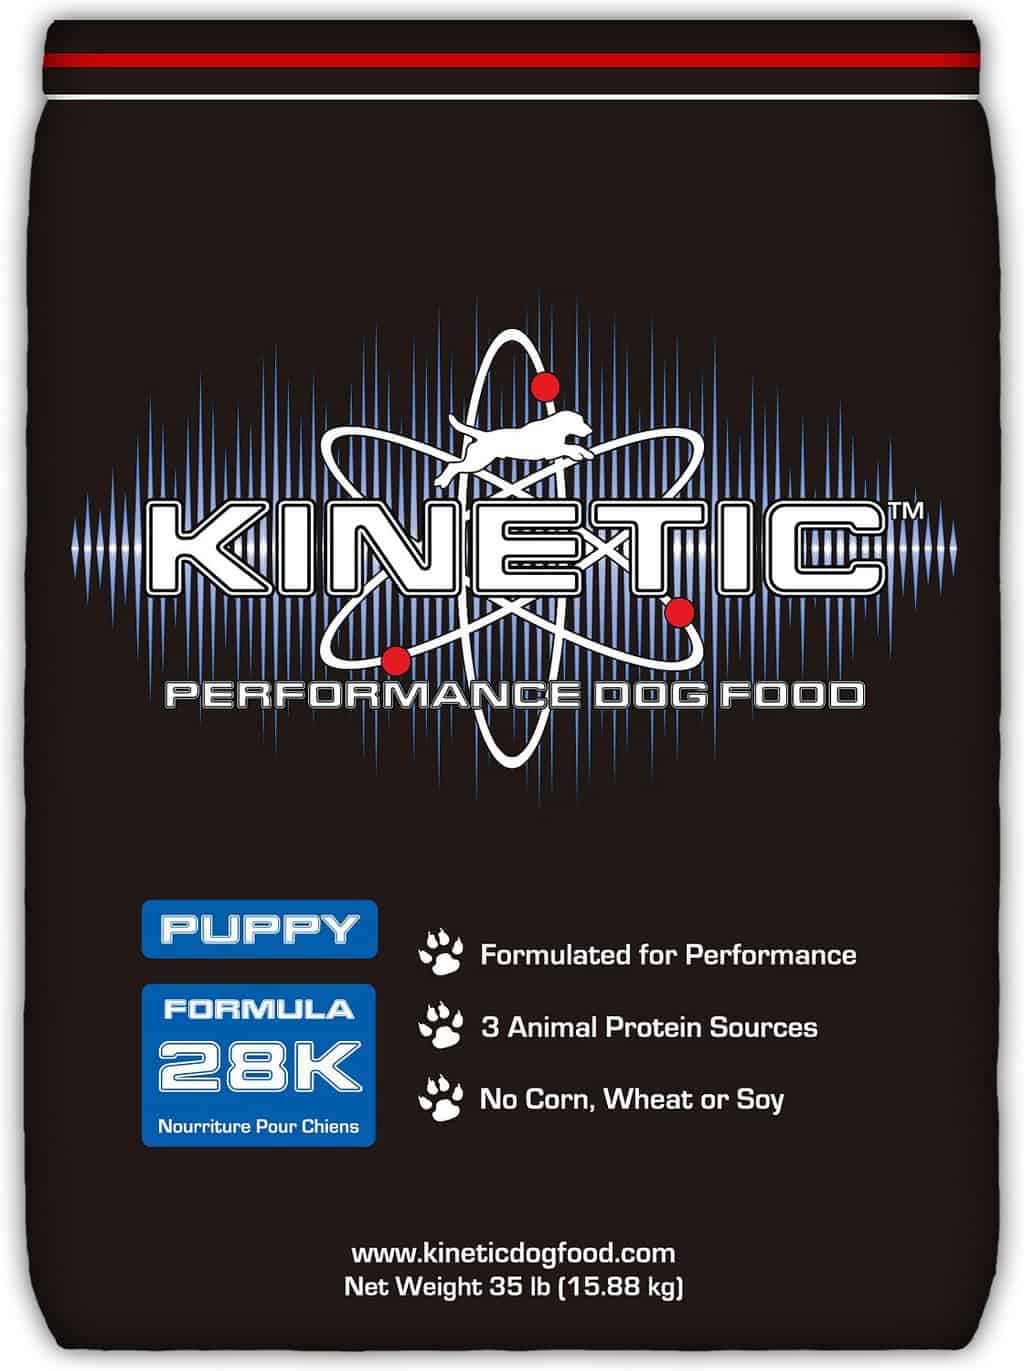 Kinetic Dog Food Reviews, Recalls & Coupons [year] 7